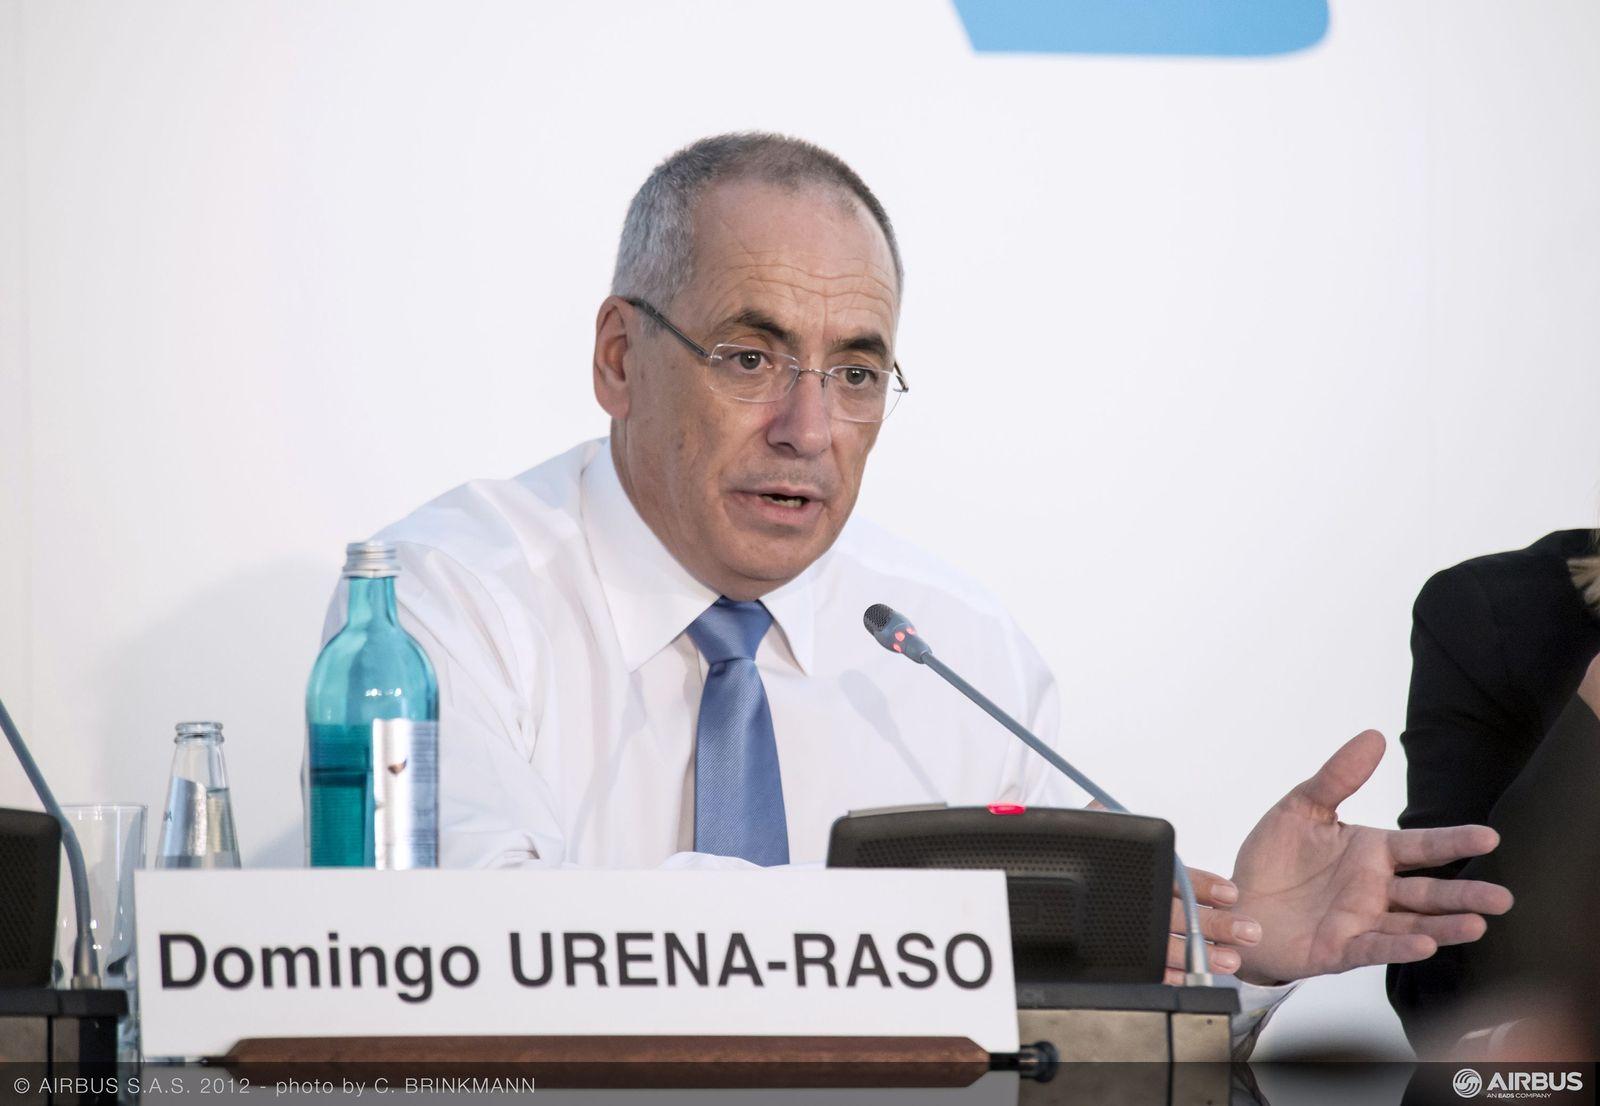 EINMALIGE VERWENDUNG Domingo Urena-Raso